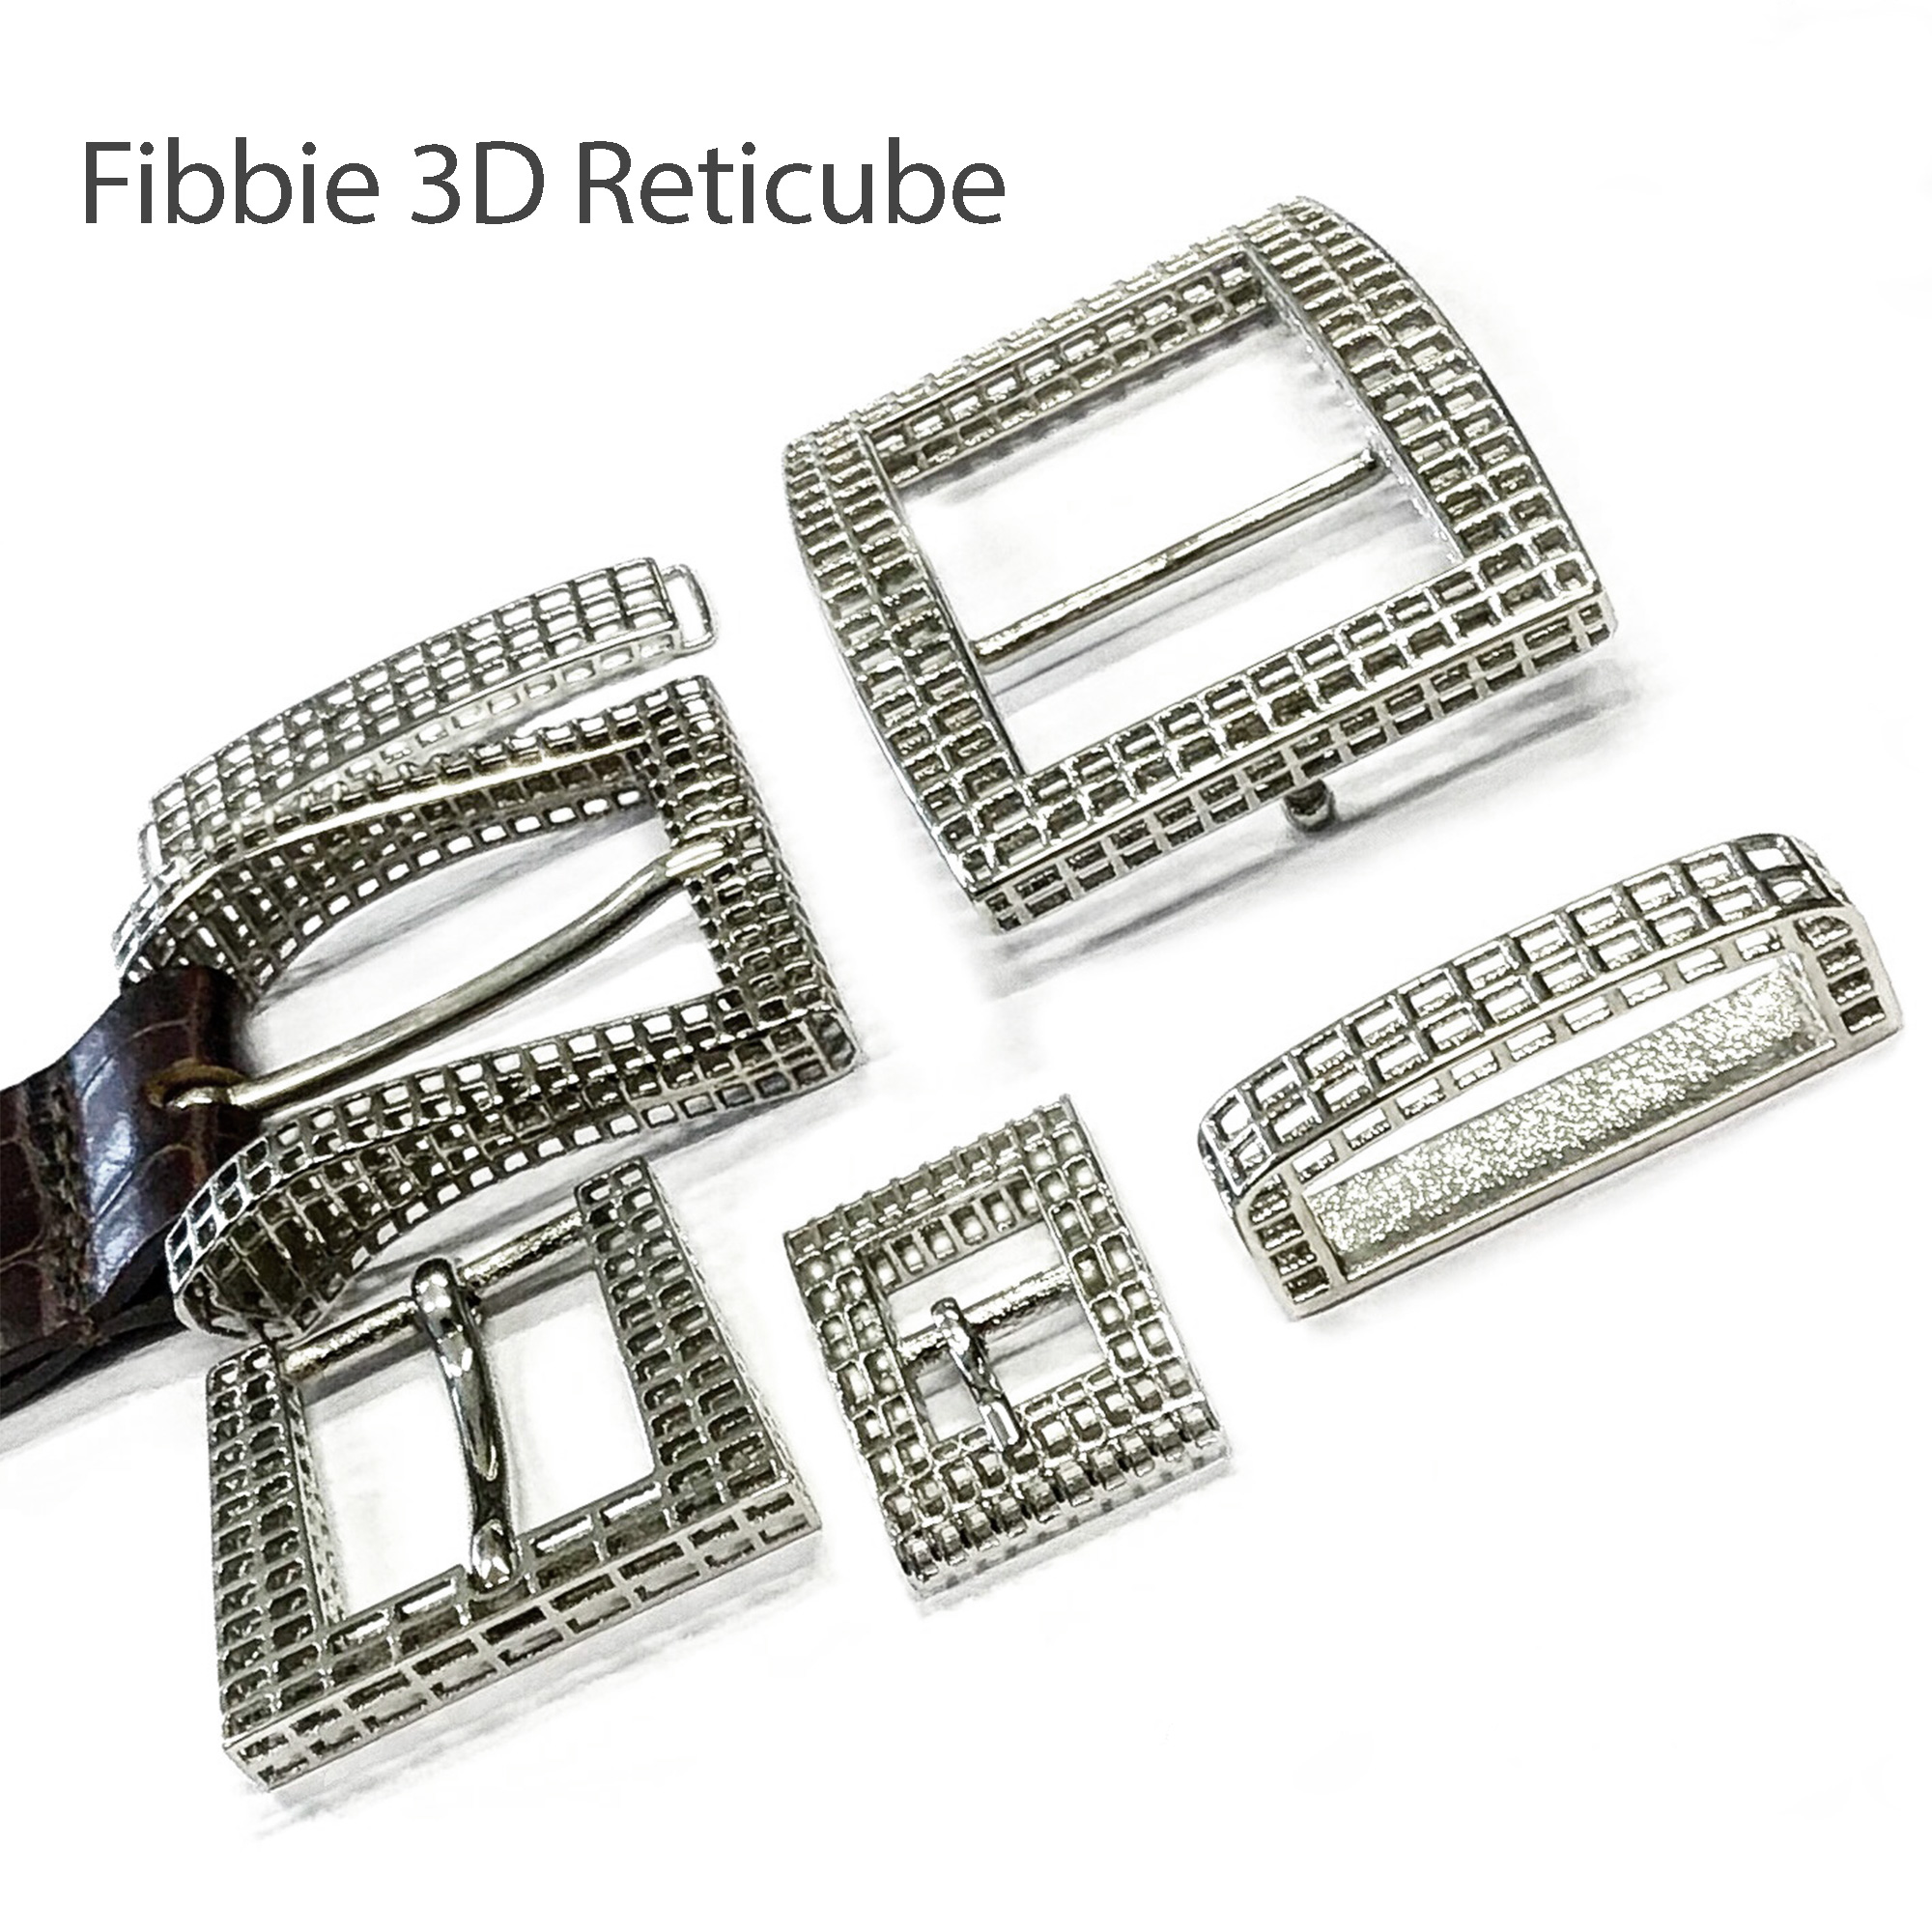 Fibbie 3D Reticube - Guimer Srl